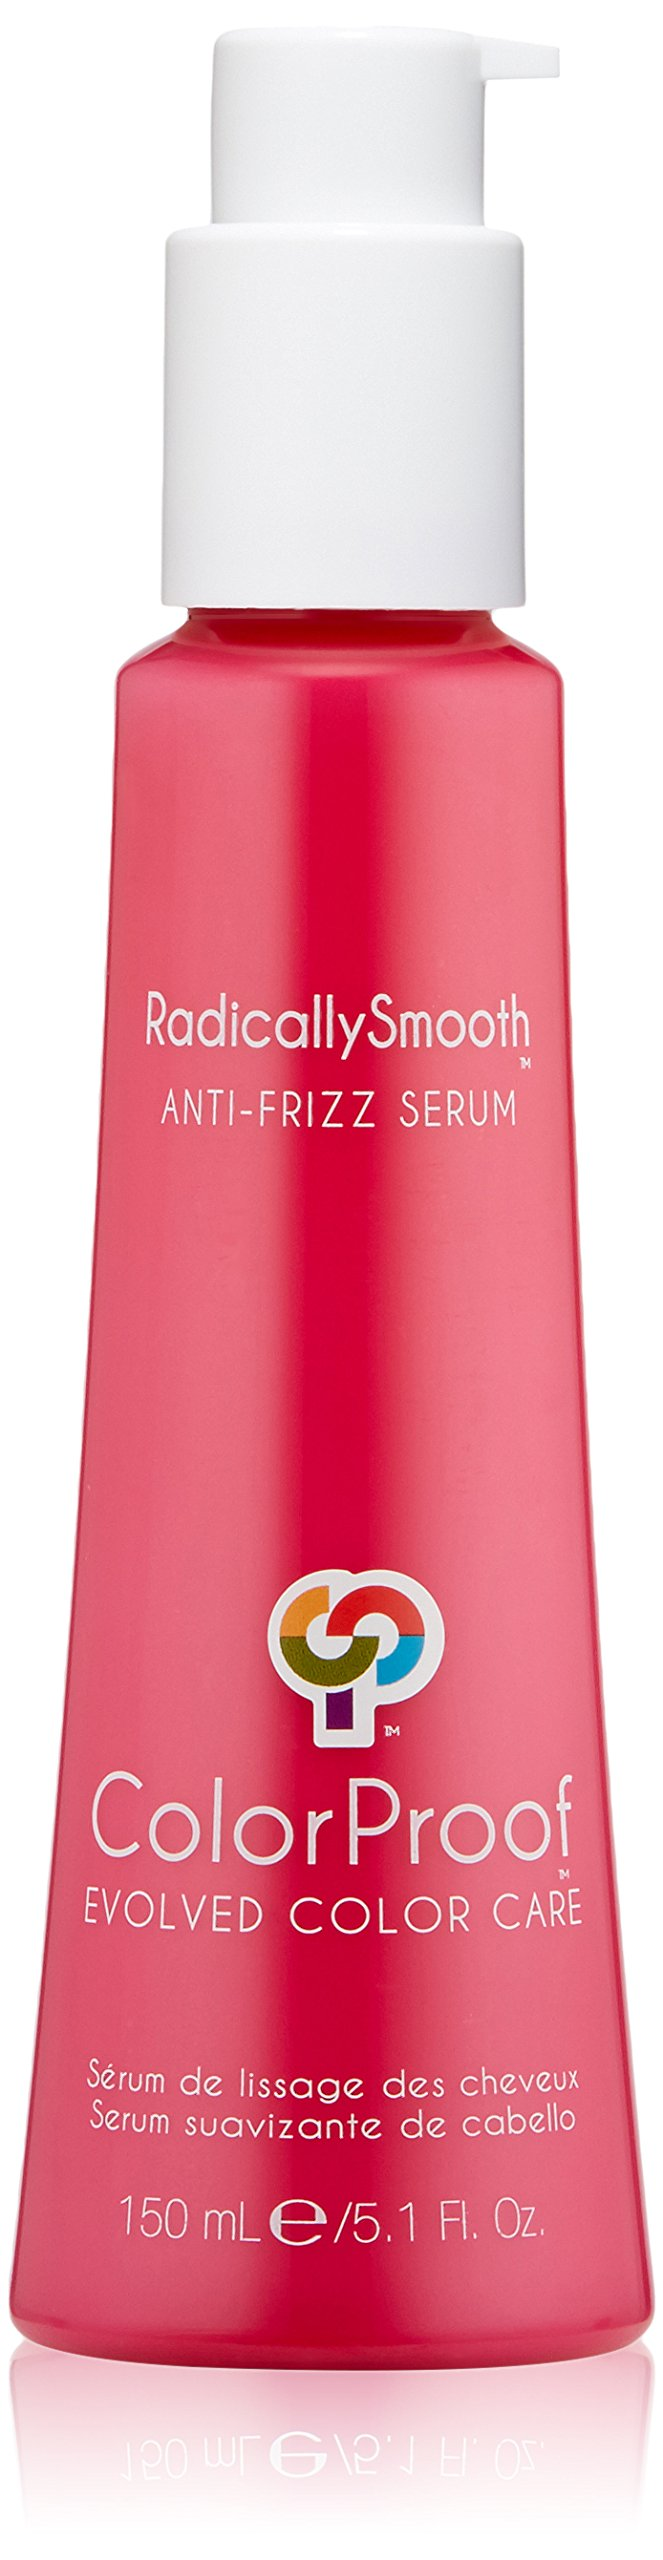 ColorProof Evolved Color Care Radicallysmooth Anti-Frizz Serum, 5.1 Fl Oz